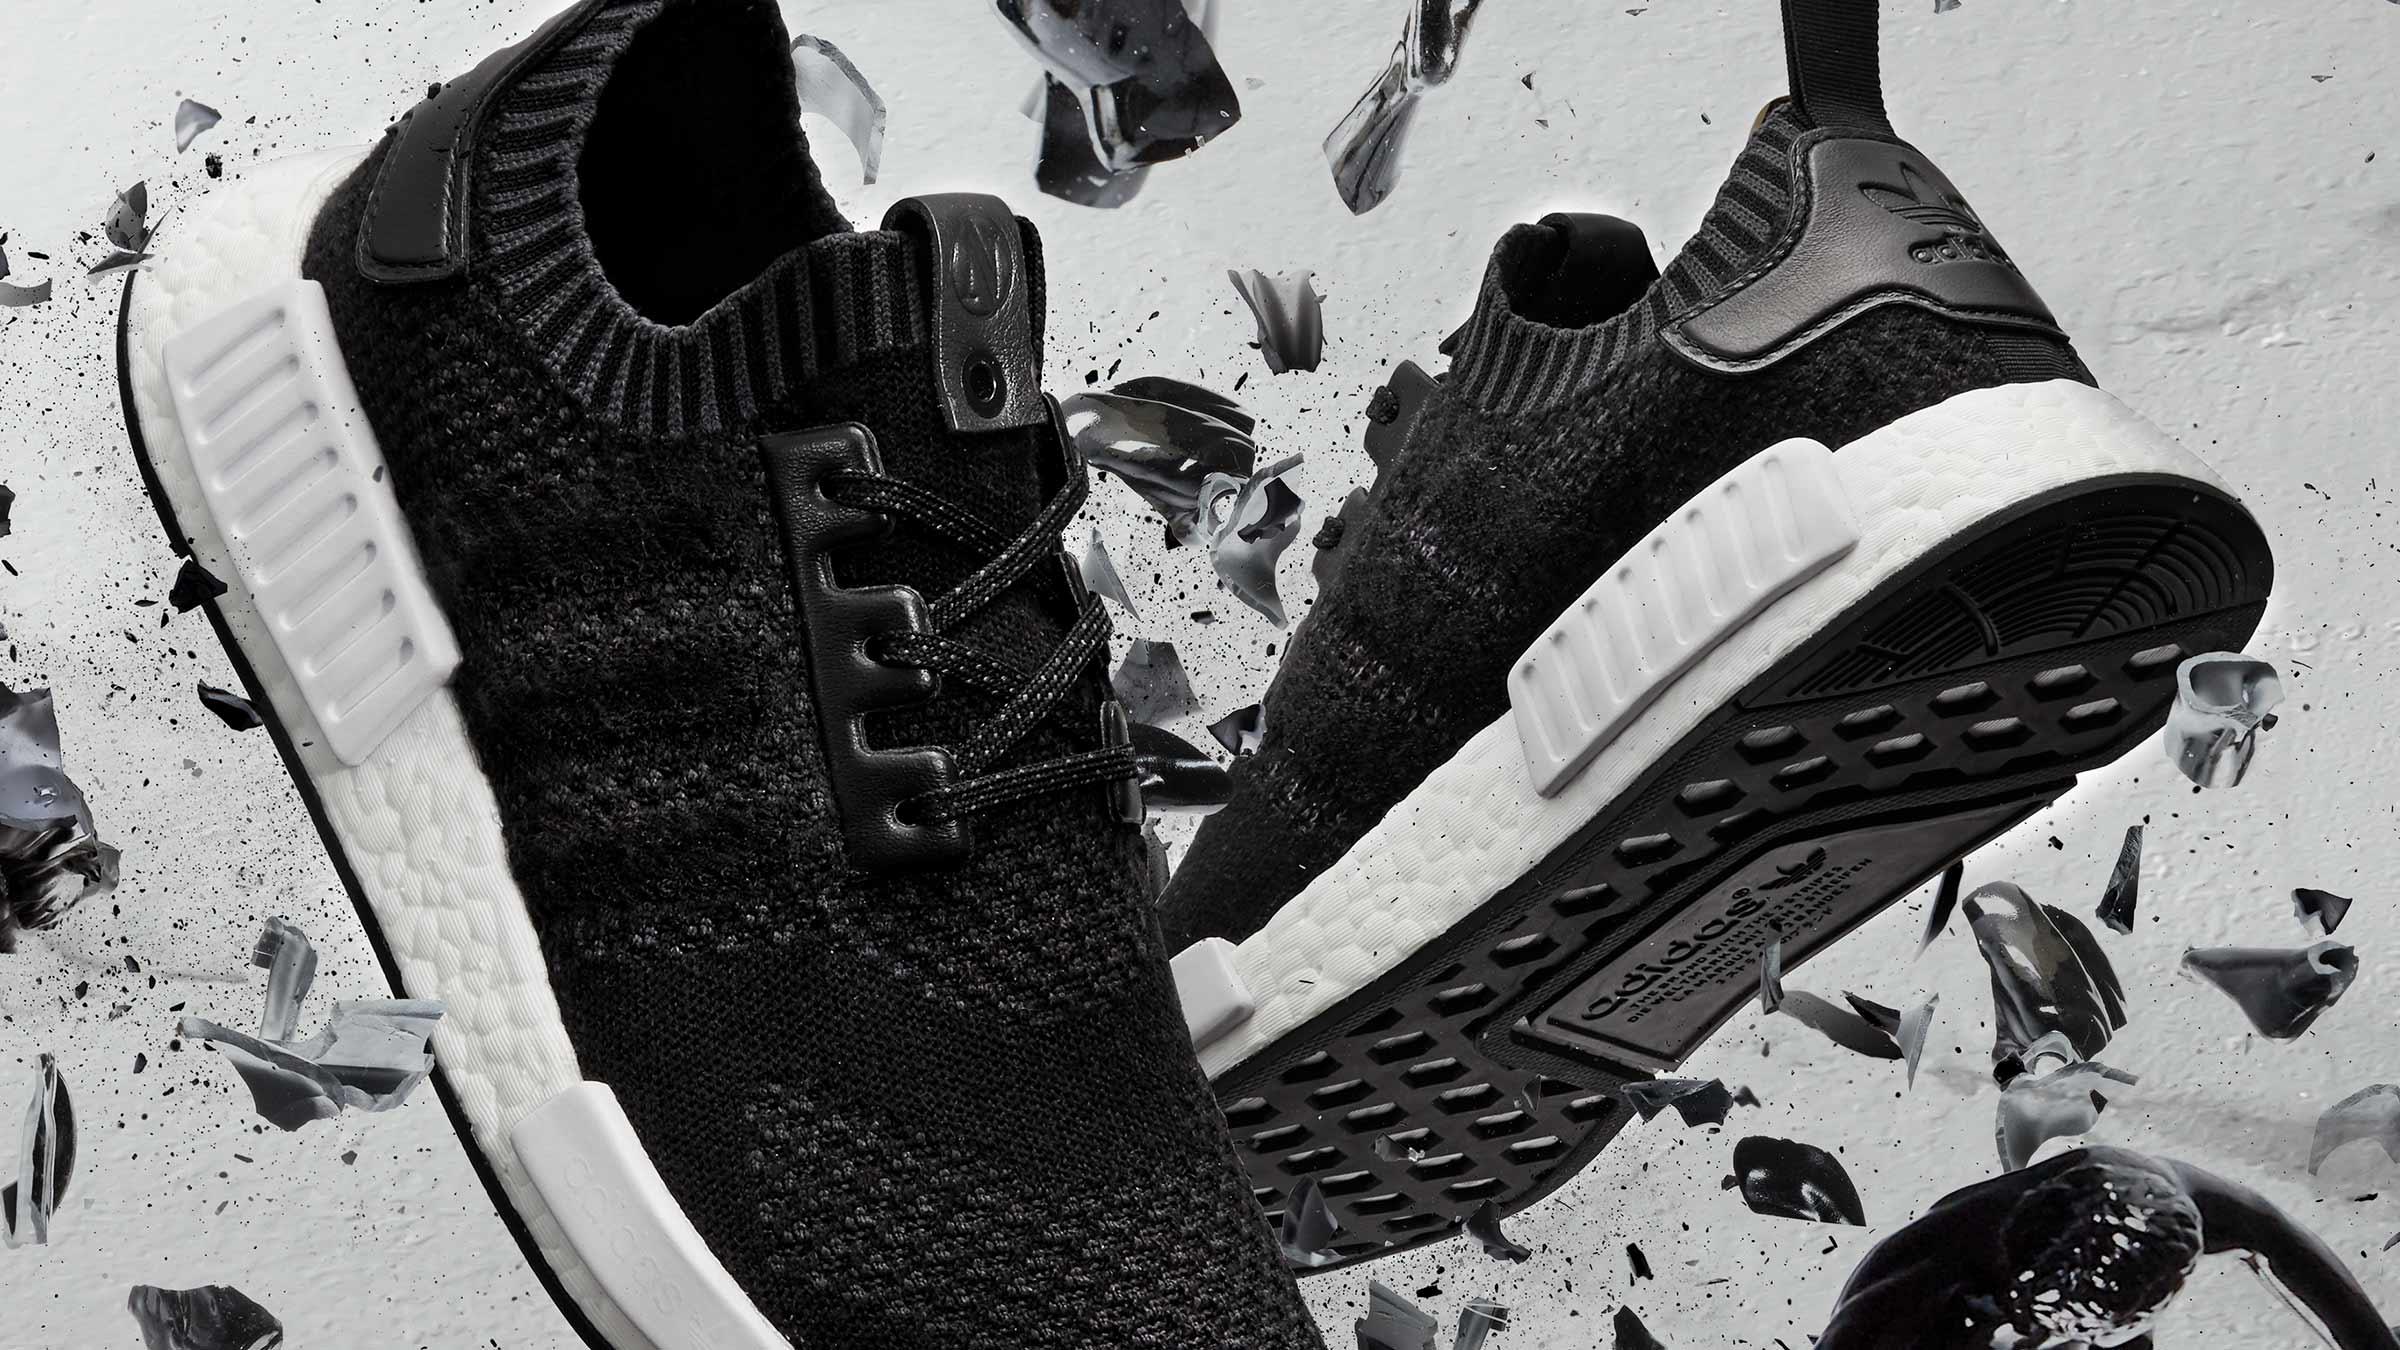 a372c3ac5d9a9 Adidas Consortium x A Ma Maniere x Invincible NMD R1 (Black)